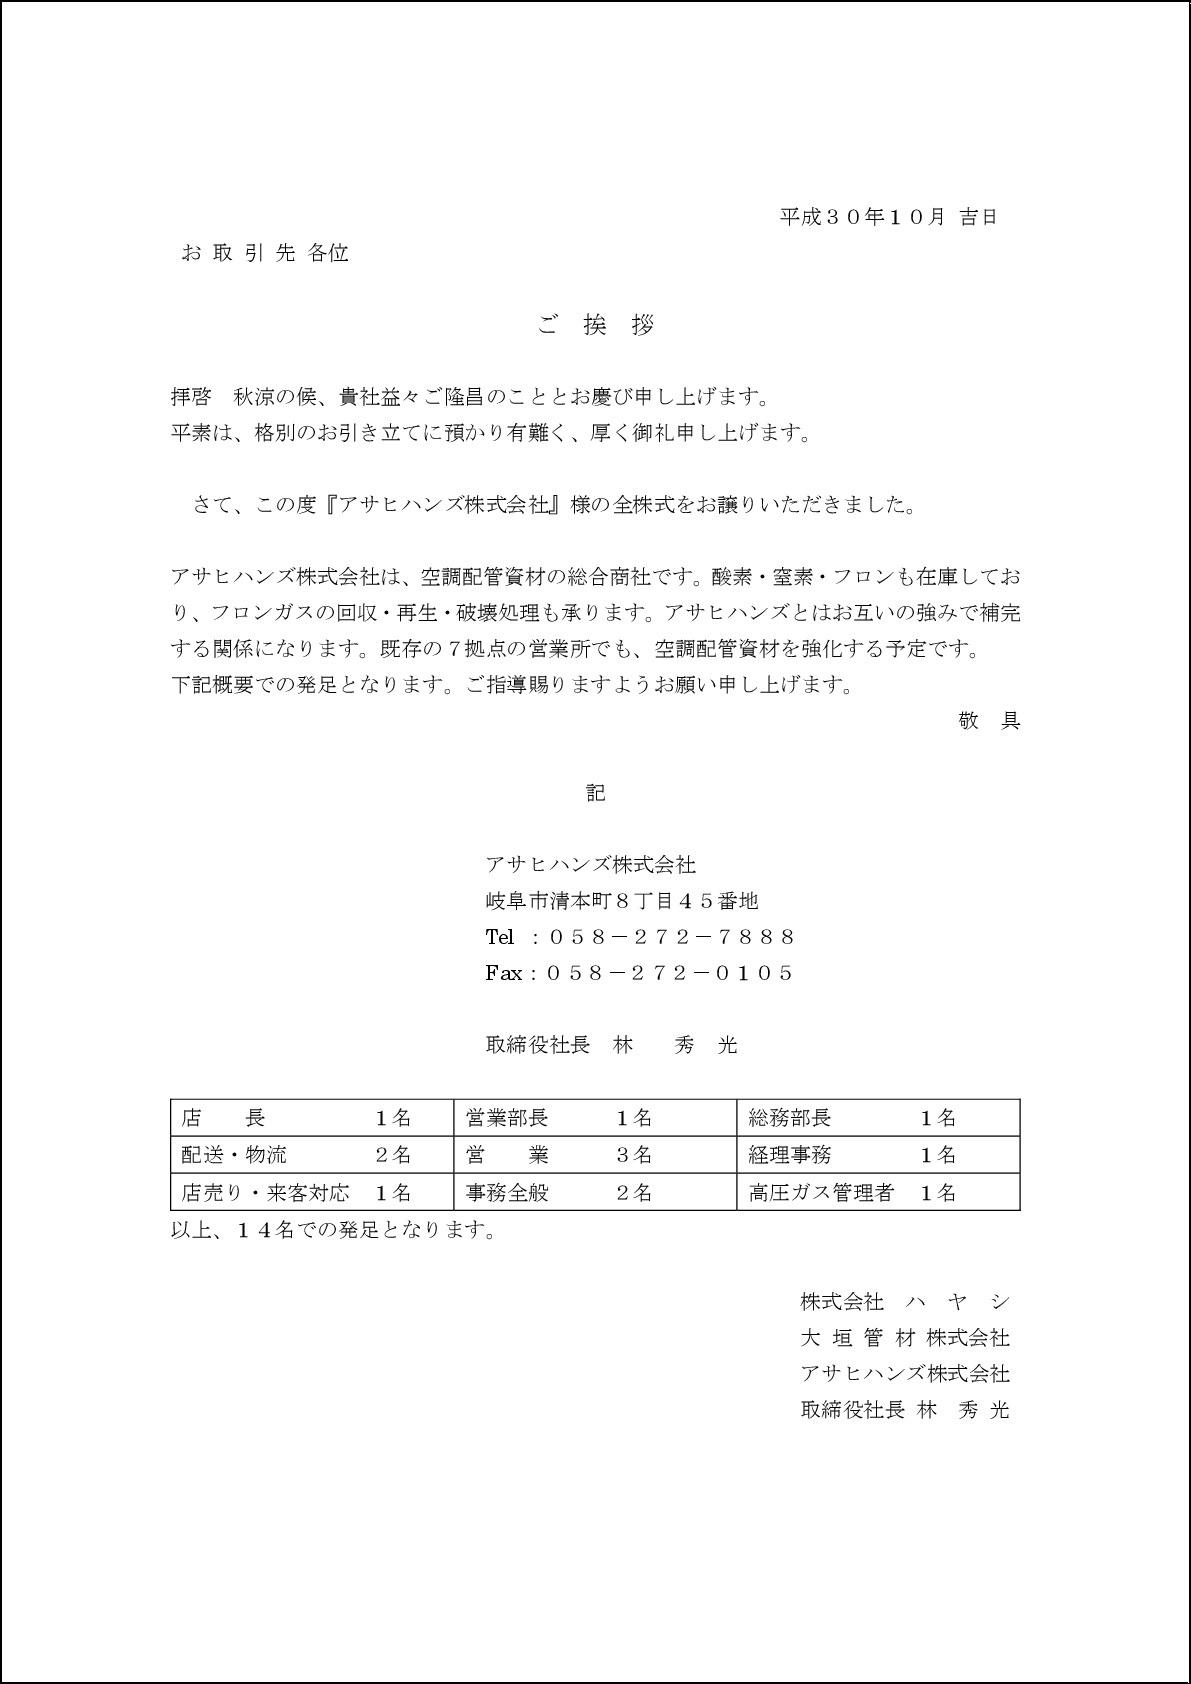 20180925 asahihanzu_aisatuzyou